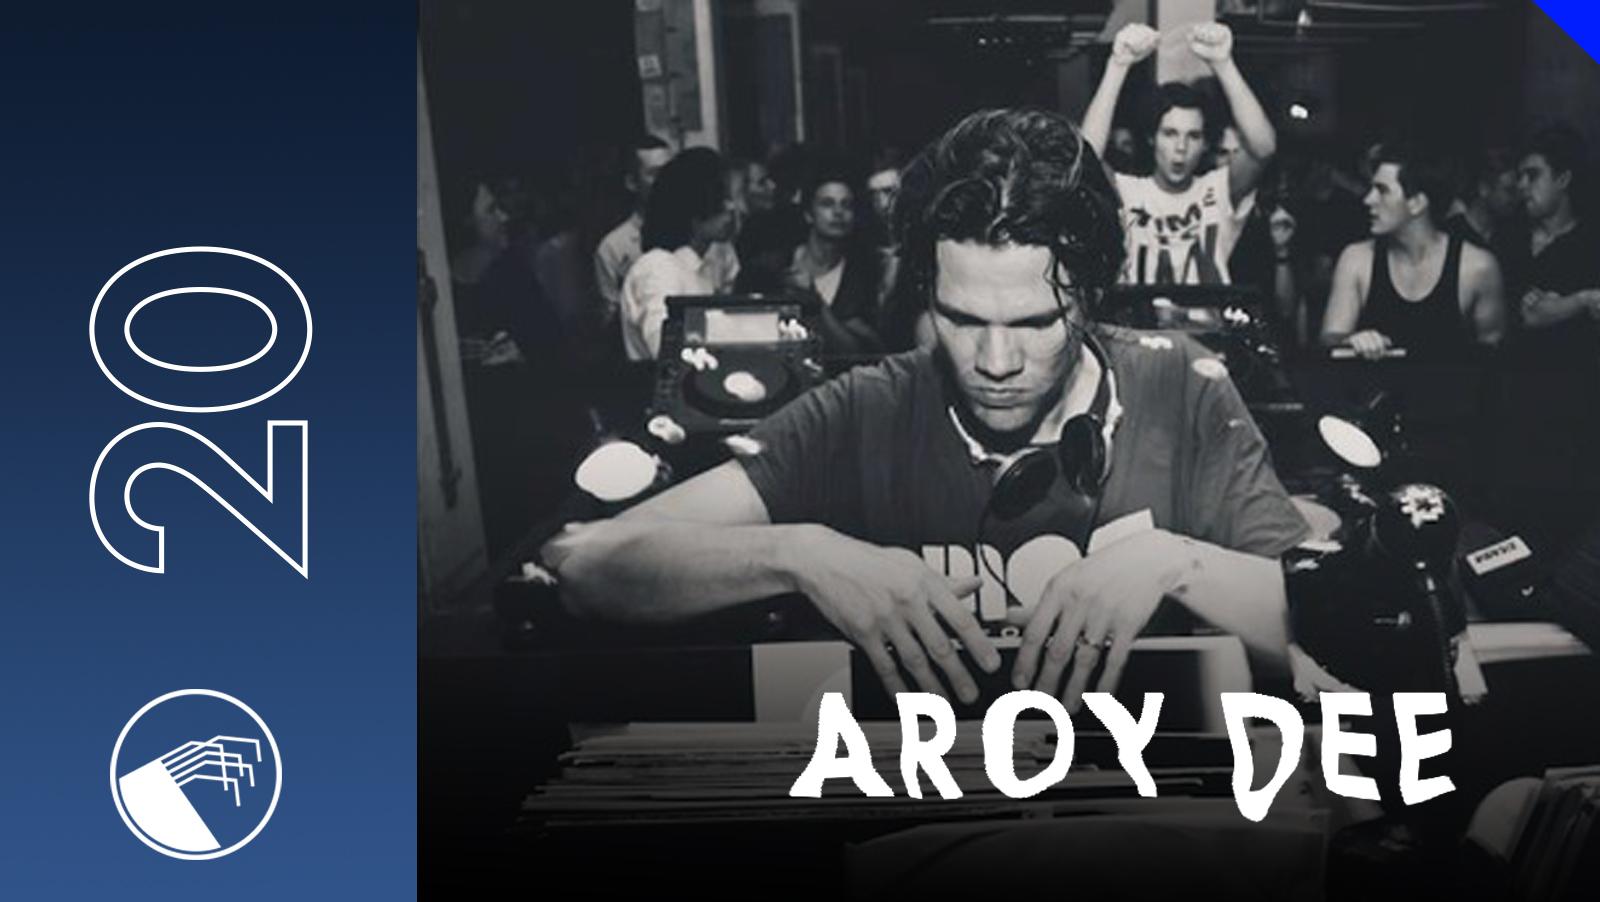 020 Aroy Dee